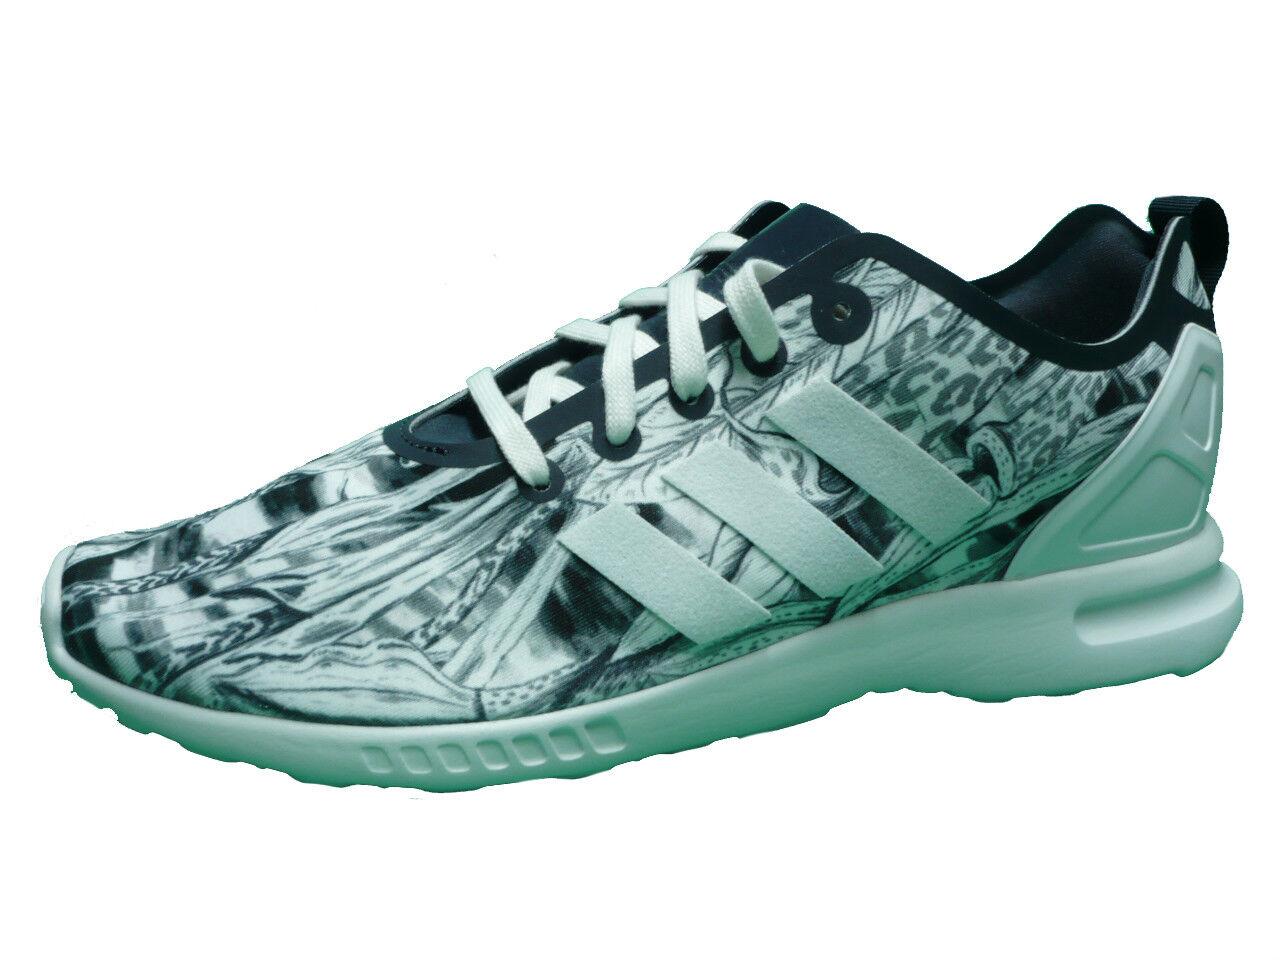 ADIDAS Originals Zx Flux smooth pattern W Scarpe Sneaker Tempo Libero Bianco